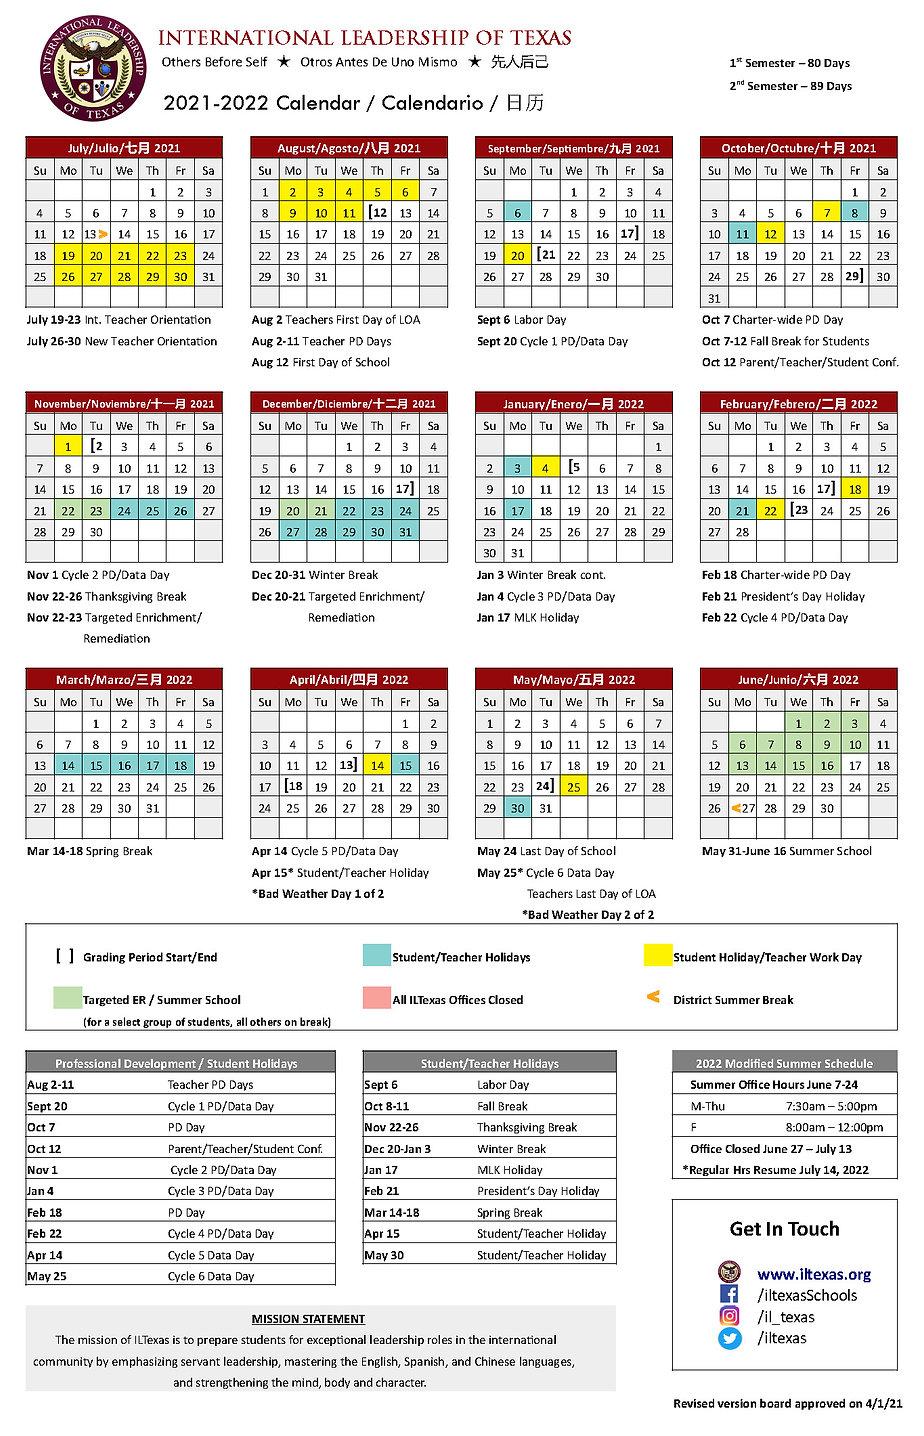 ILTexas 2021-2022 Calendar.jpg